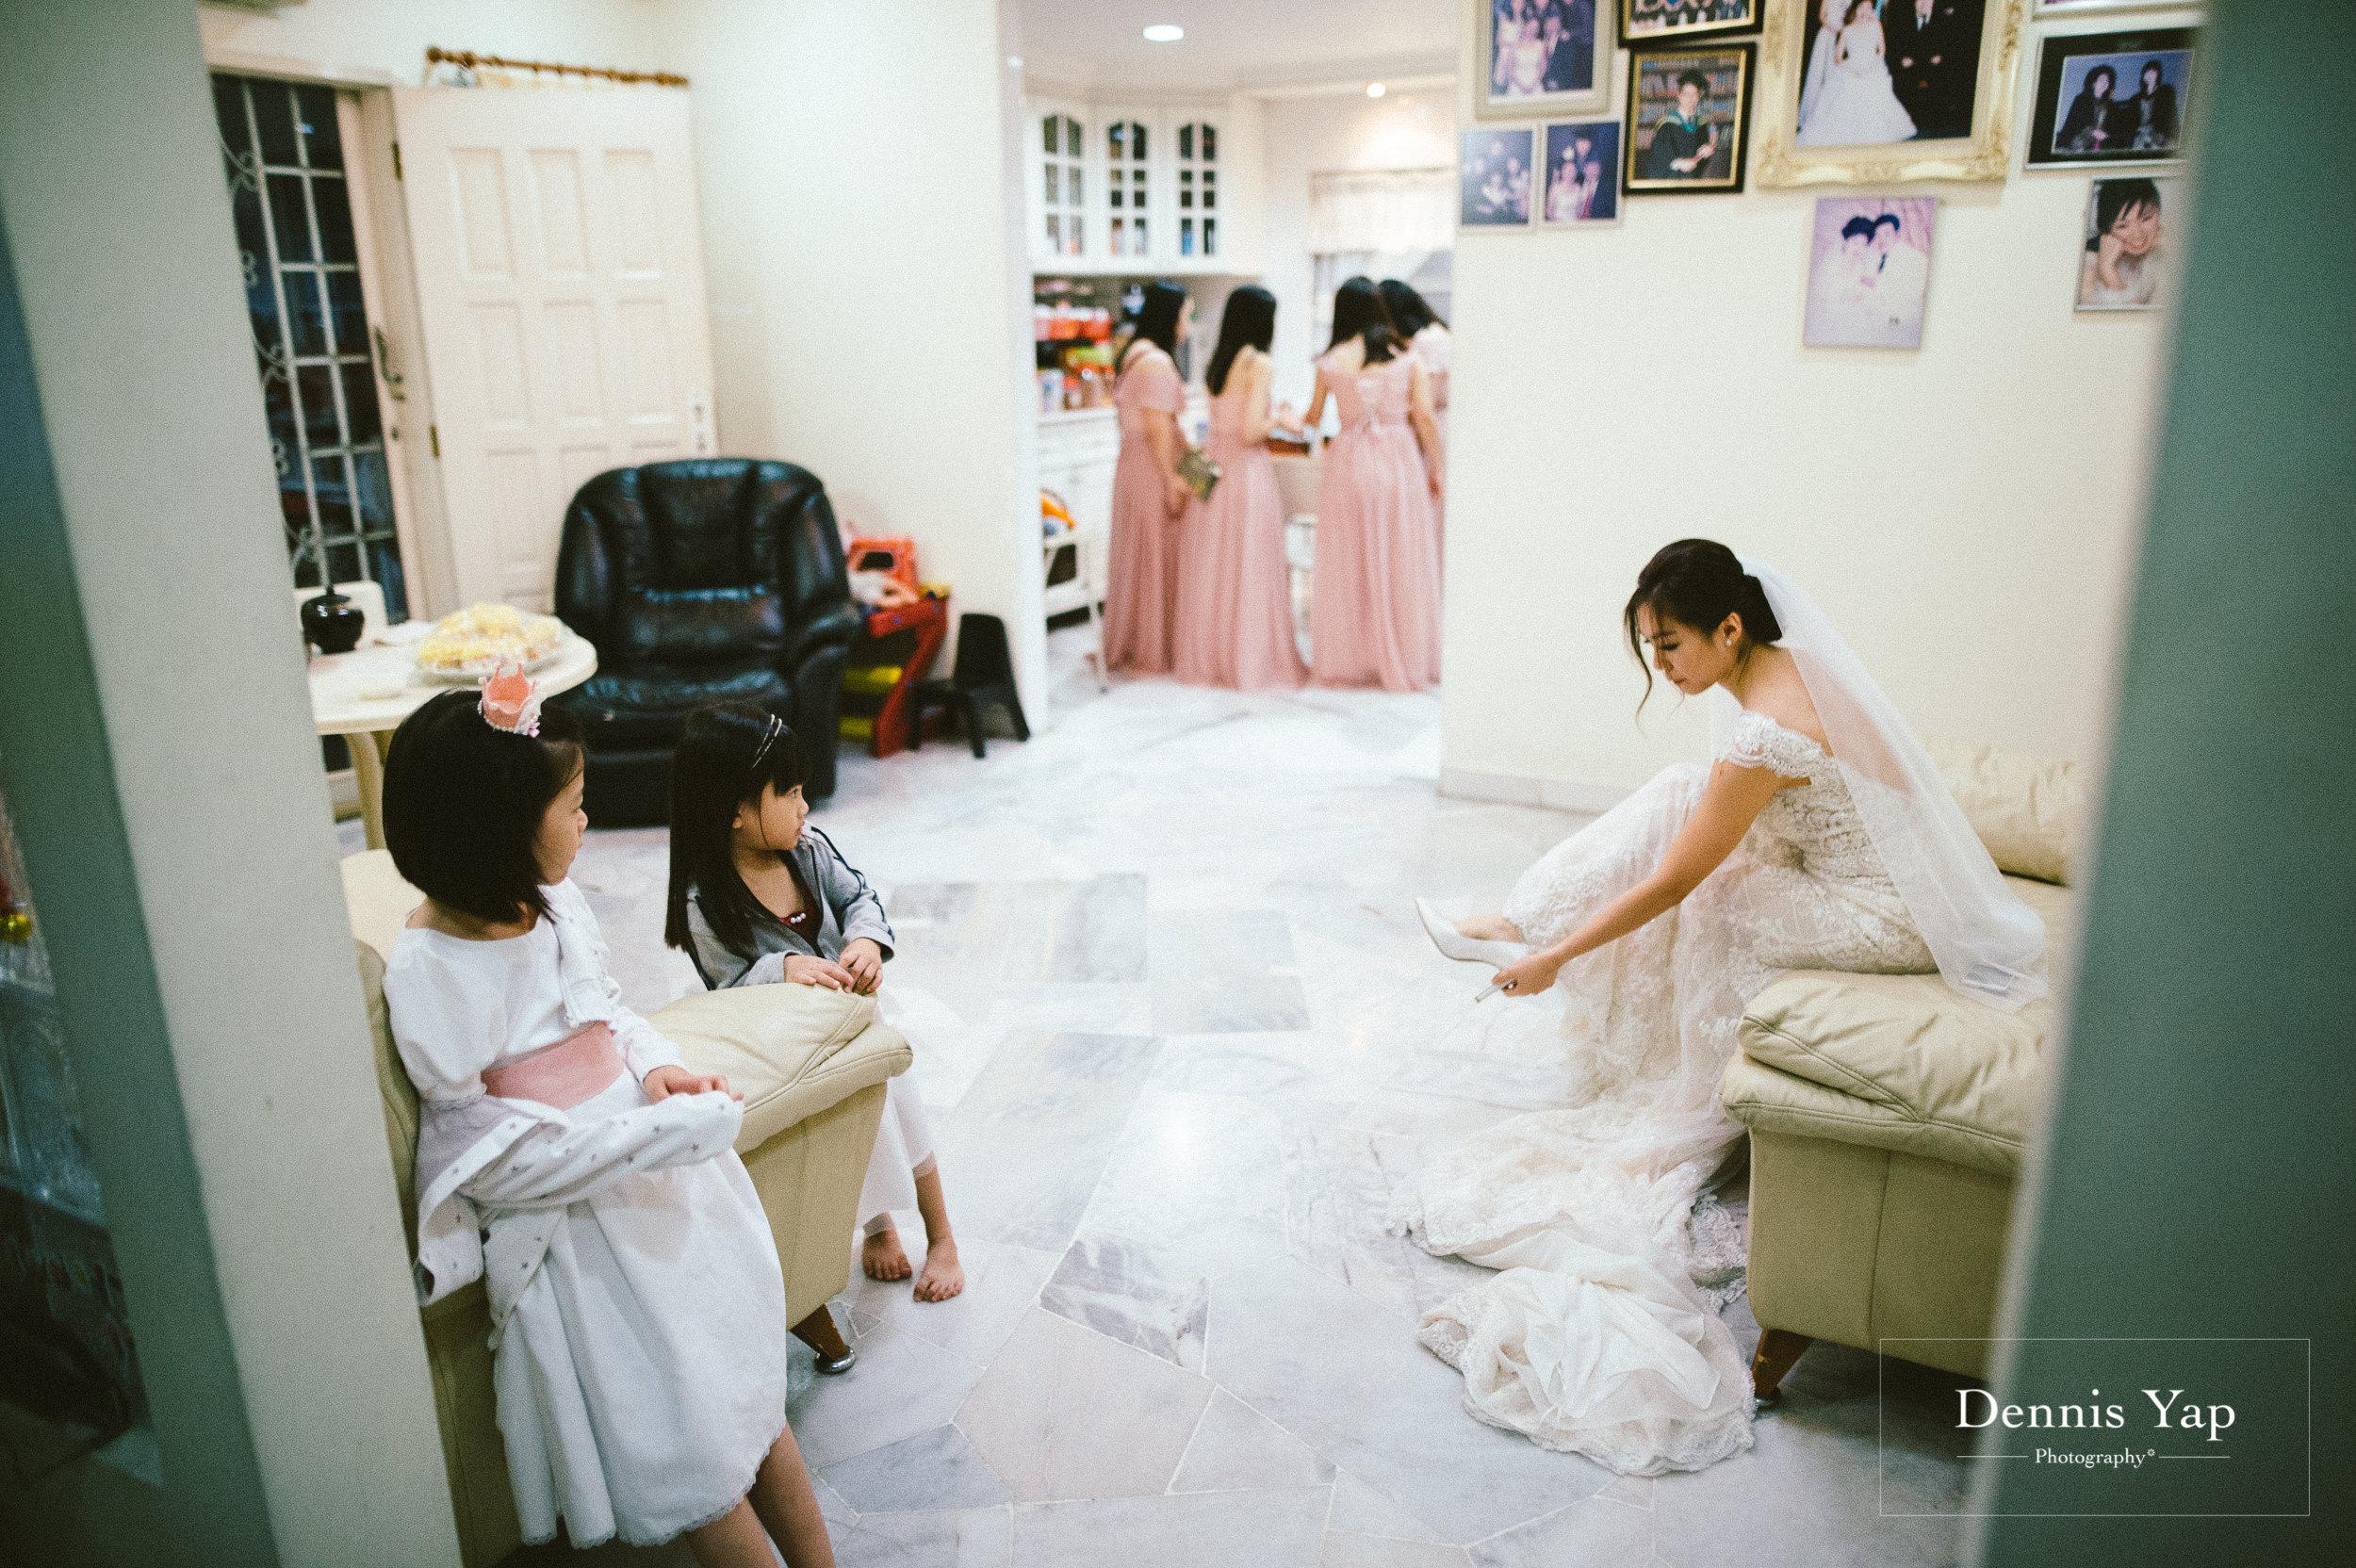 chuan wai angela wedding day bukit jelutong selangor malaysia dennis yap photography-1.jpg